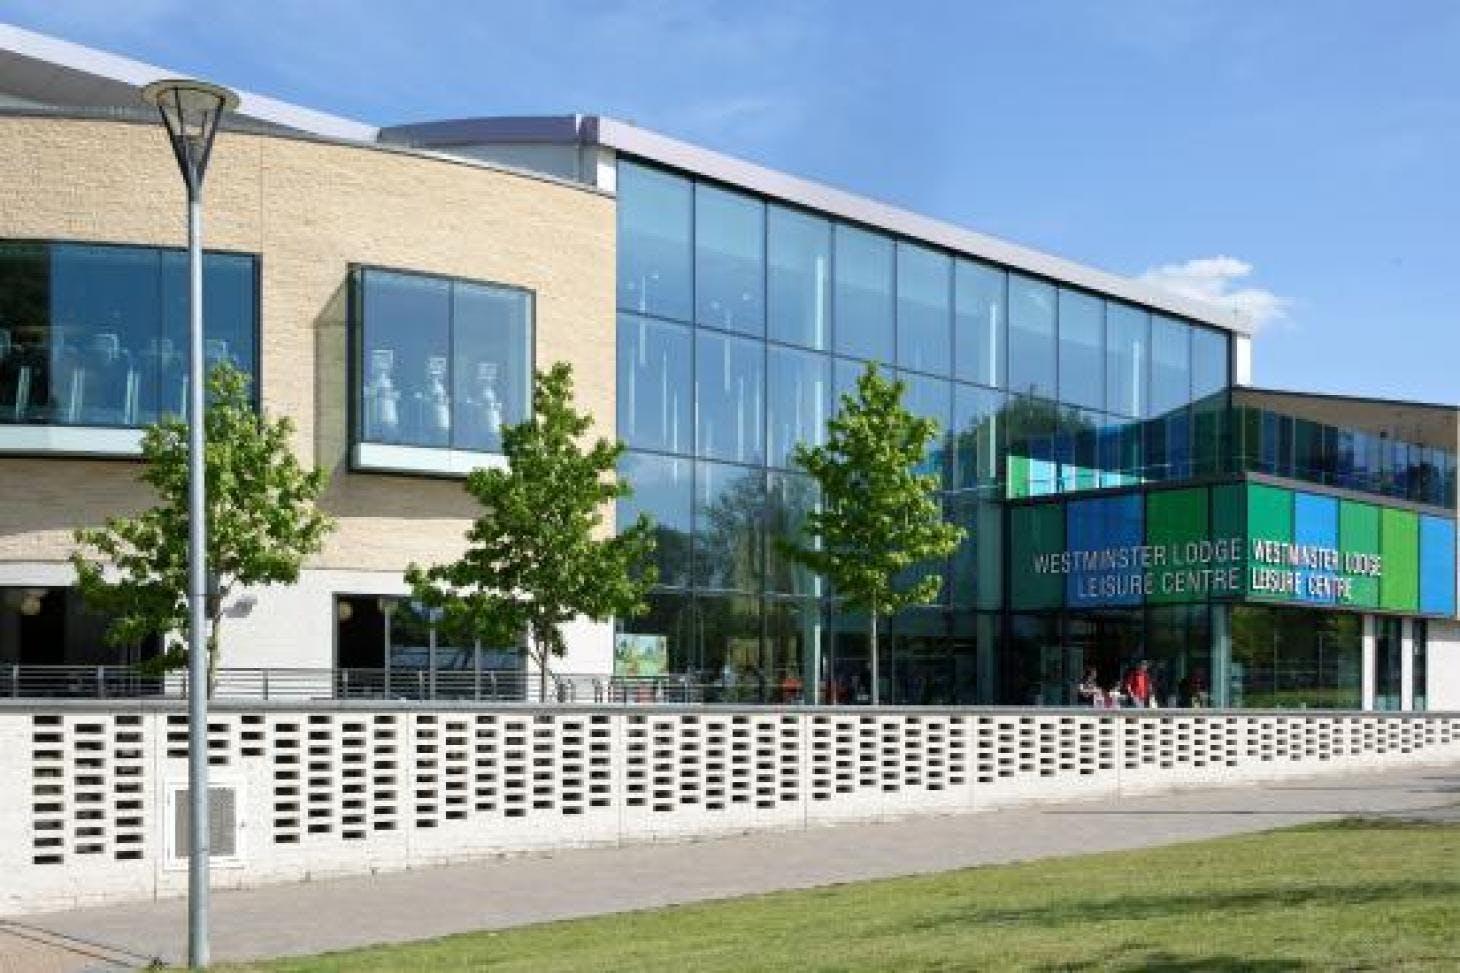 Westminster Lodge Leisure Centre Indoor | Hard badminton court